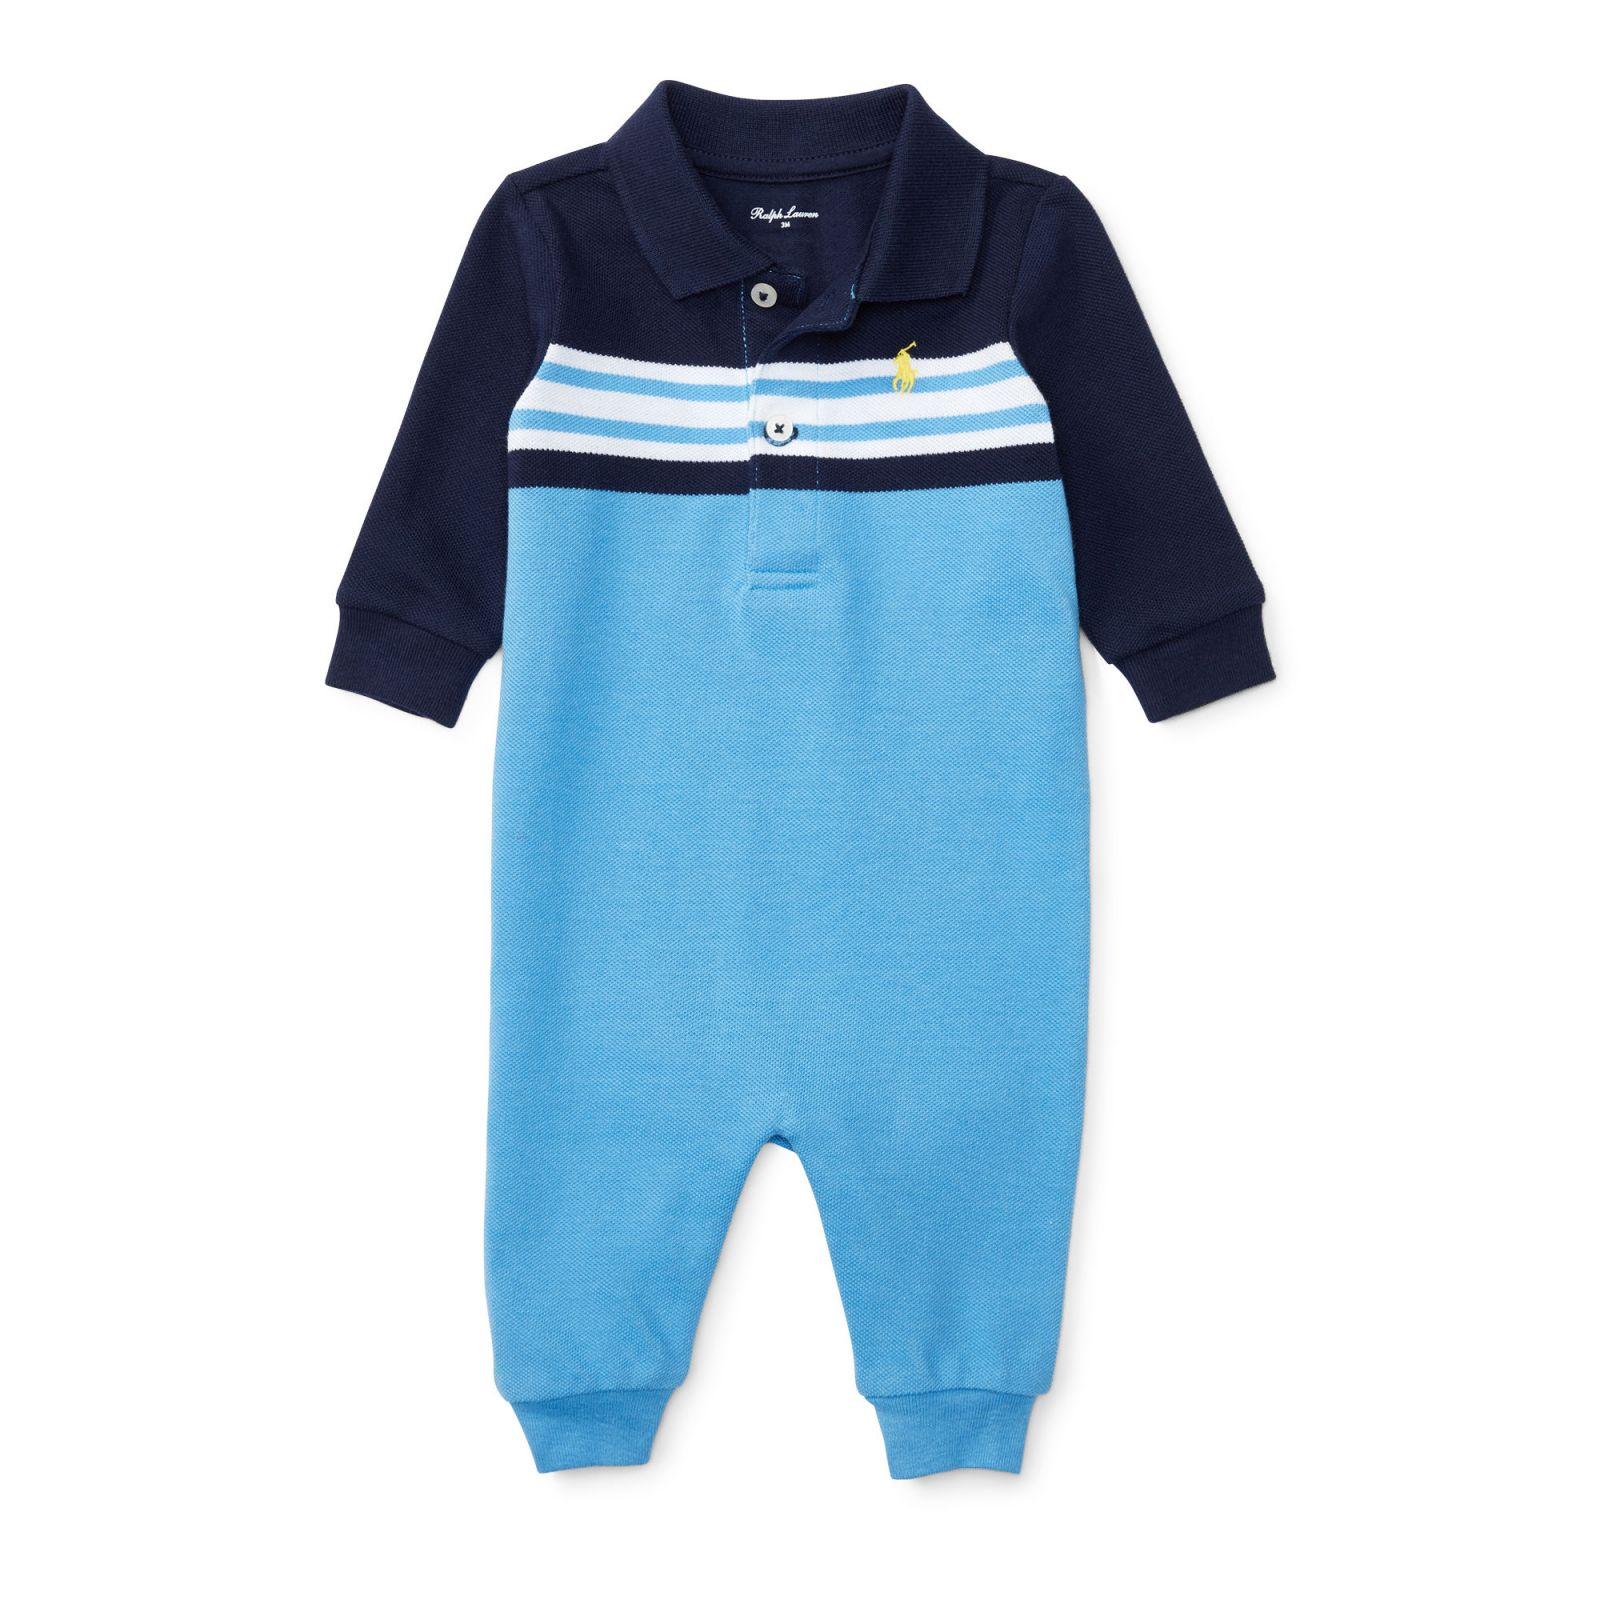 Ralph Lauren oblečení pro miminko Cotton Mesh Polo Coverall modrá